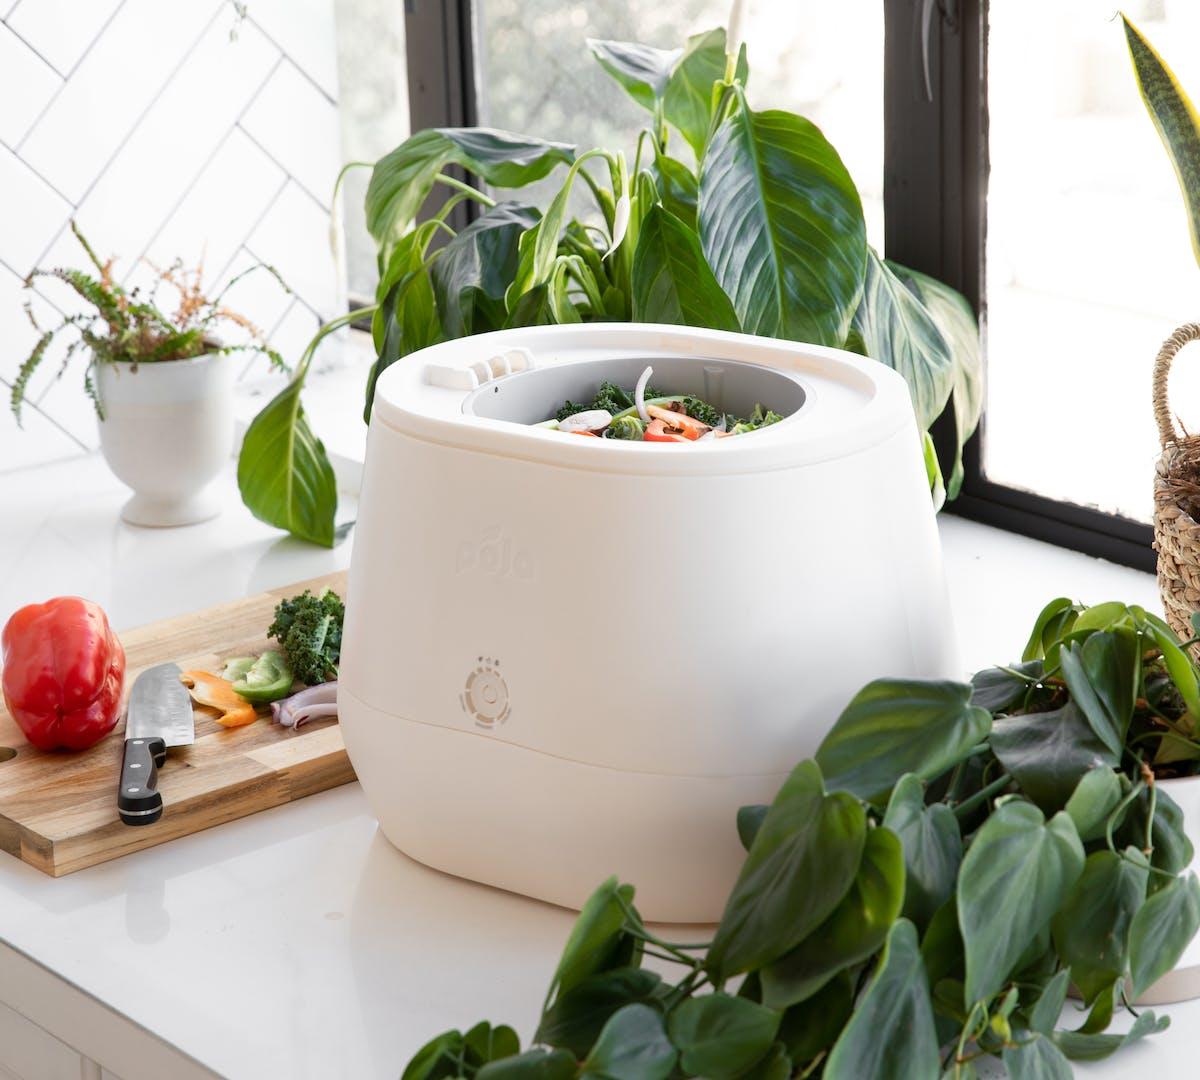 Lomi countertop composter